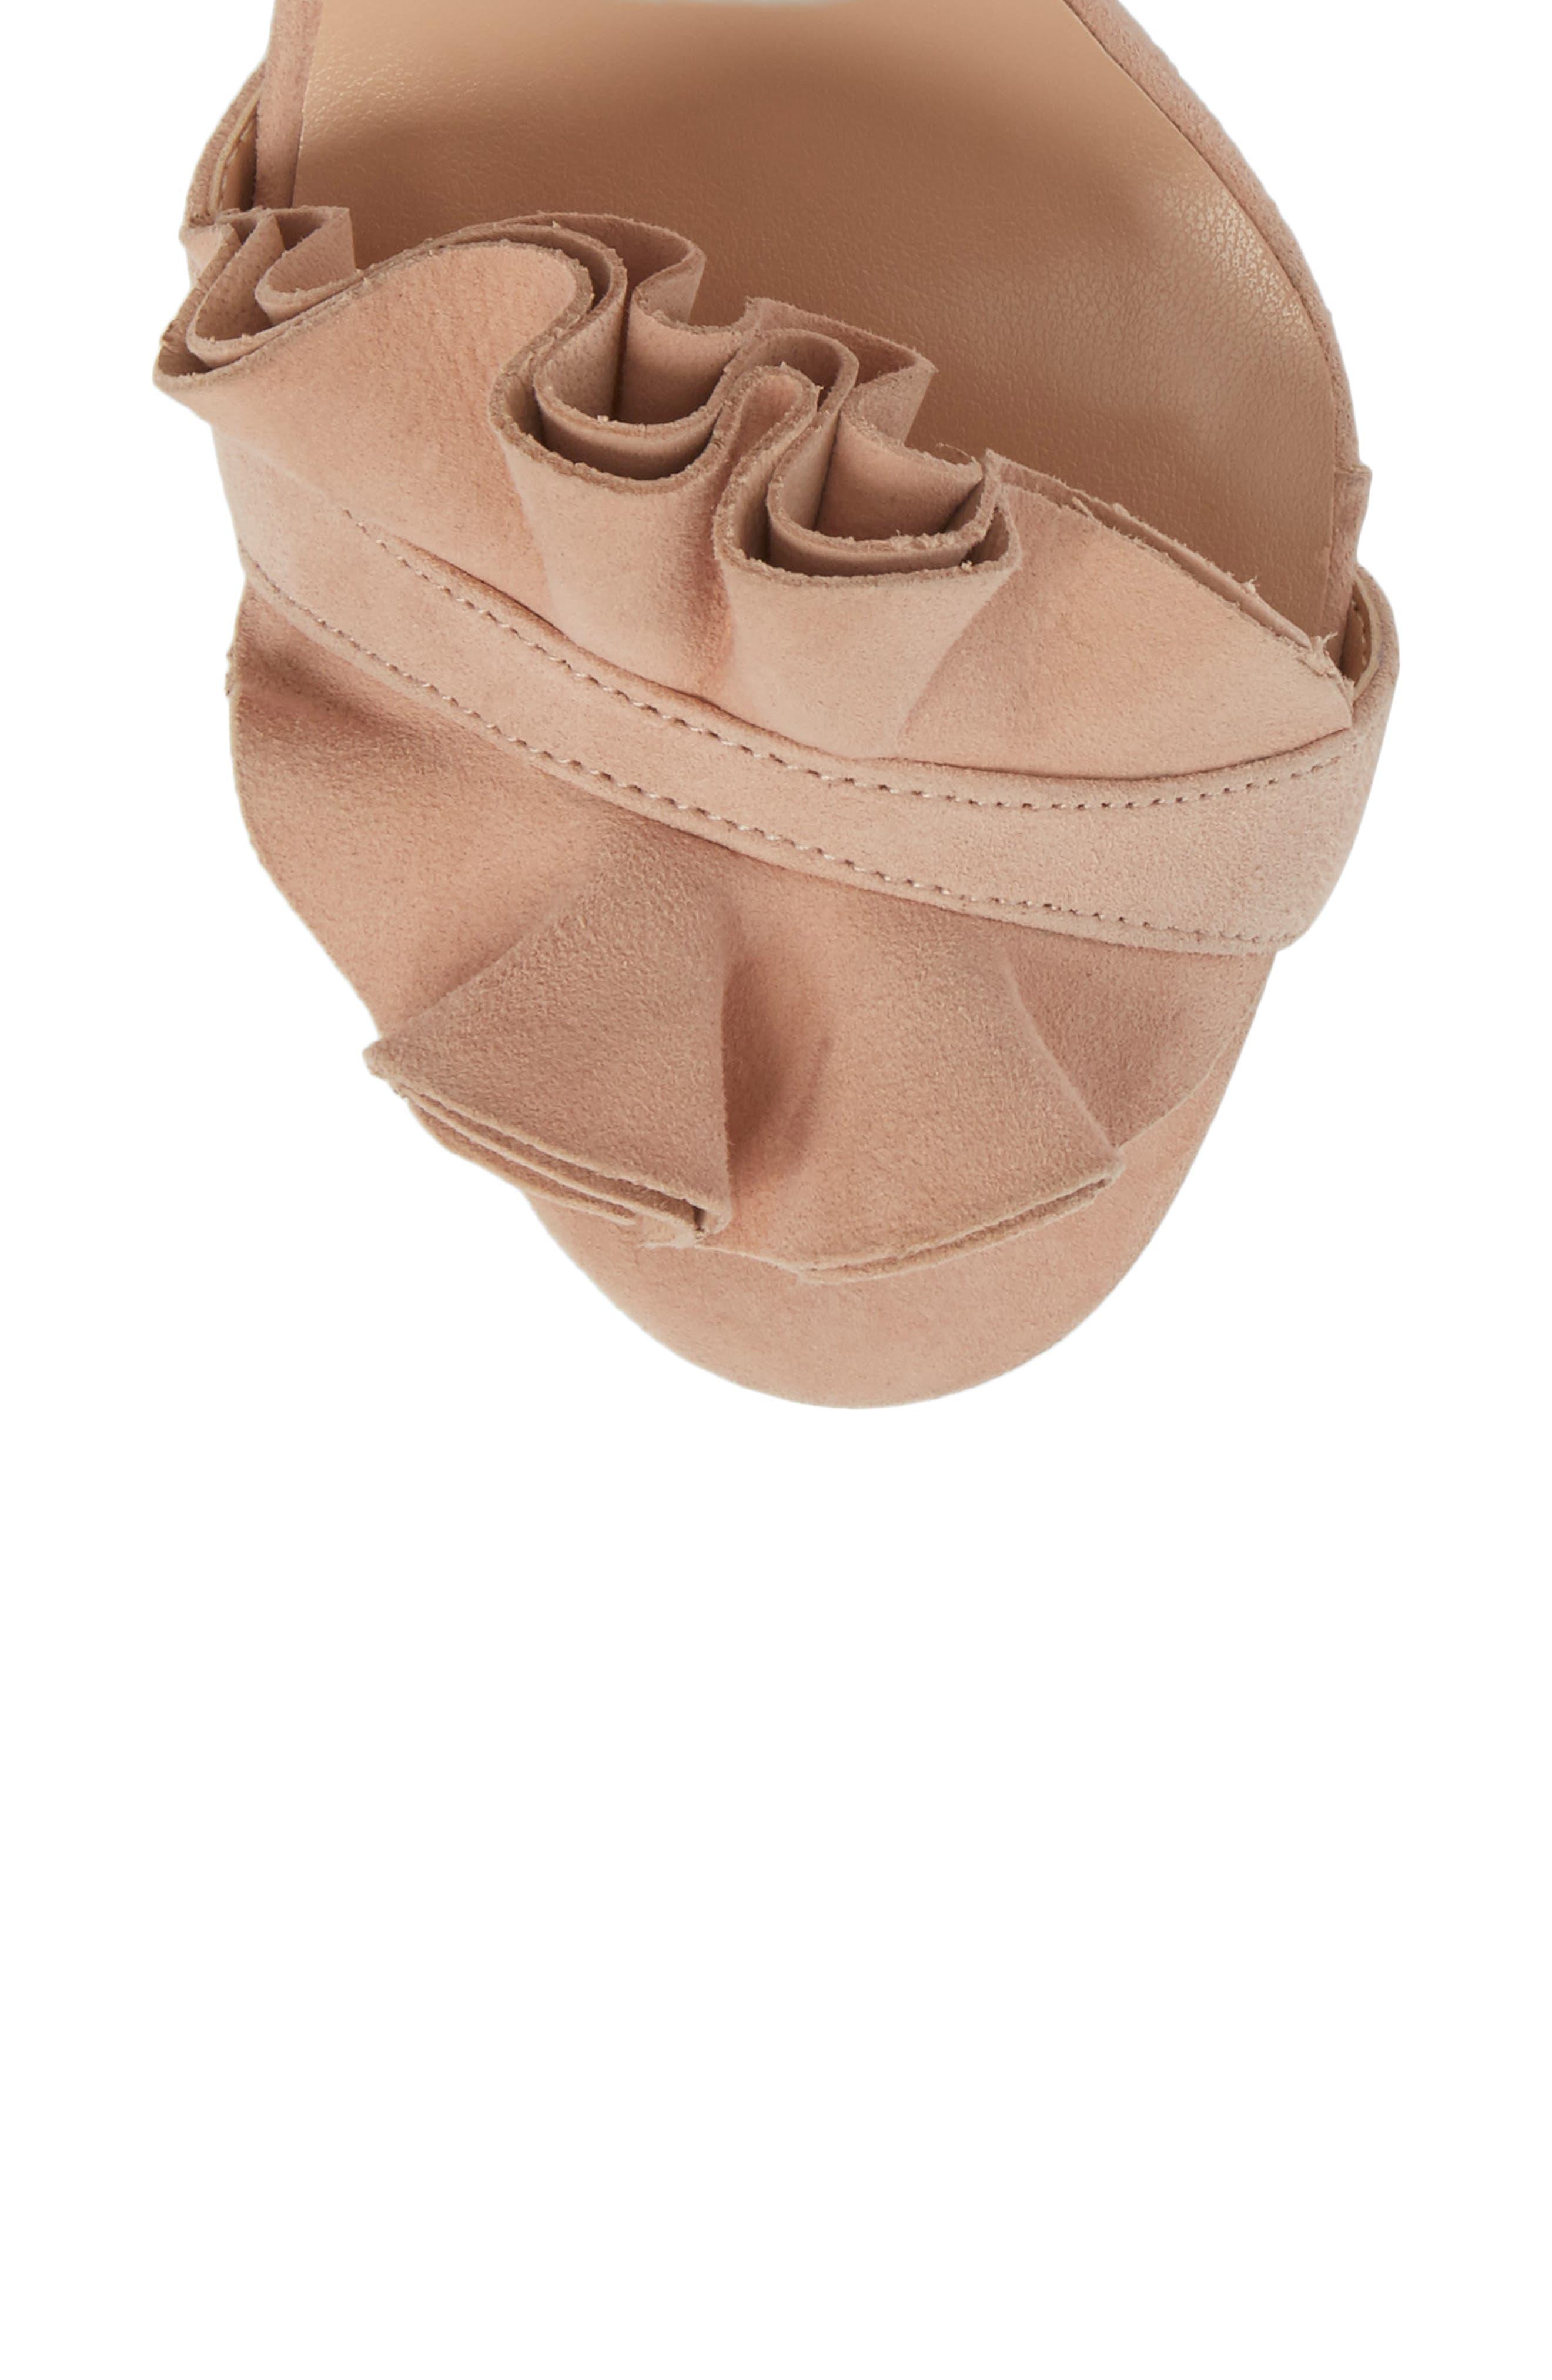 Kalipso Ruffled Wraparound Sandal,                             Alternate thumbnail 4, color,                             Blush Suede